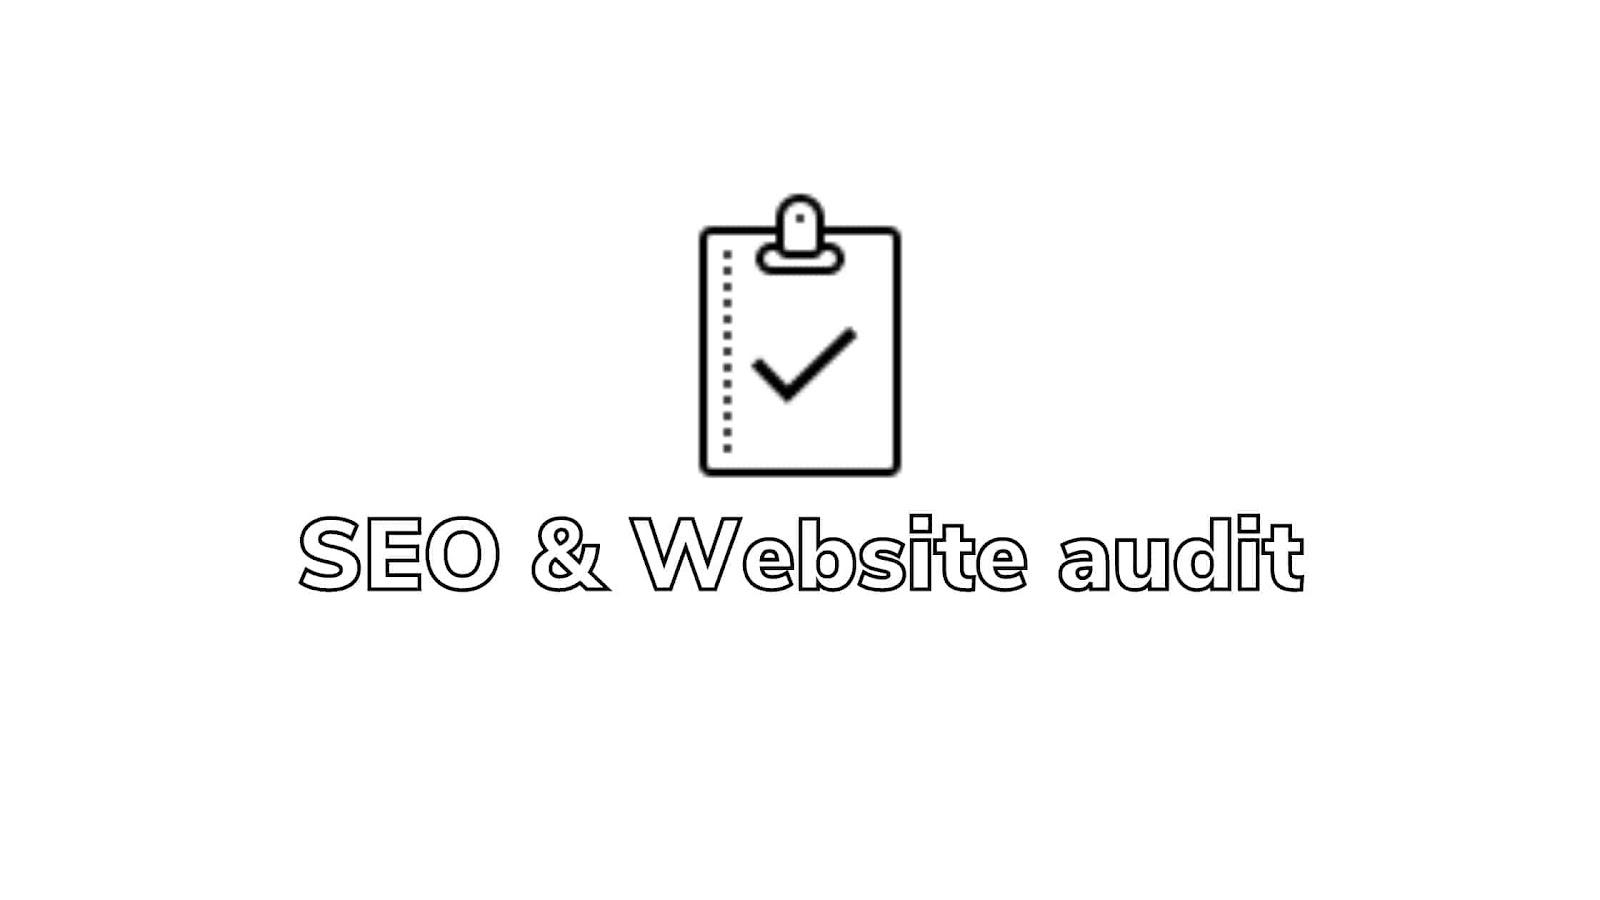 SEO & Website audit